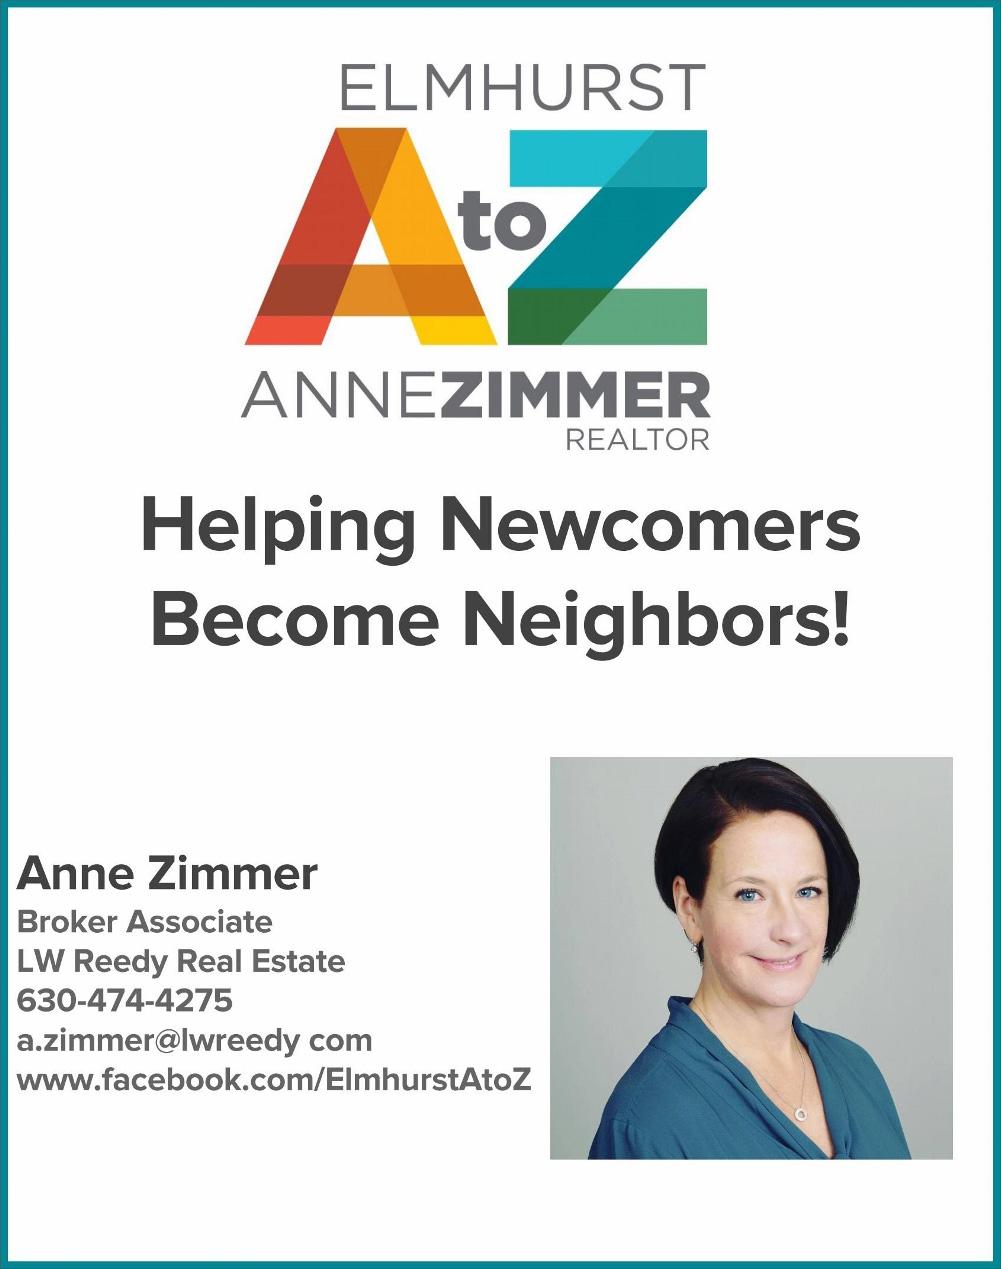 ENNC advertisement for Anne Zimmer